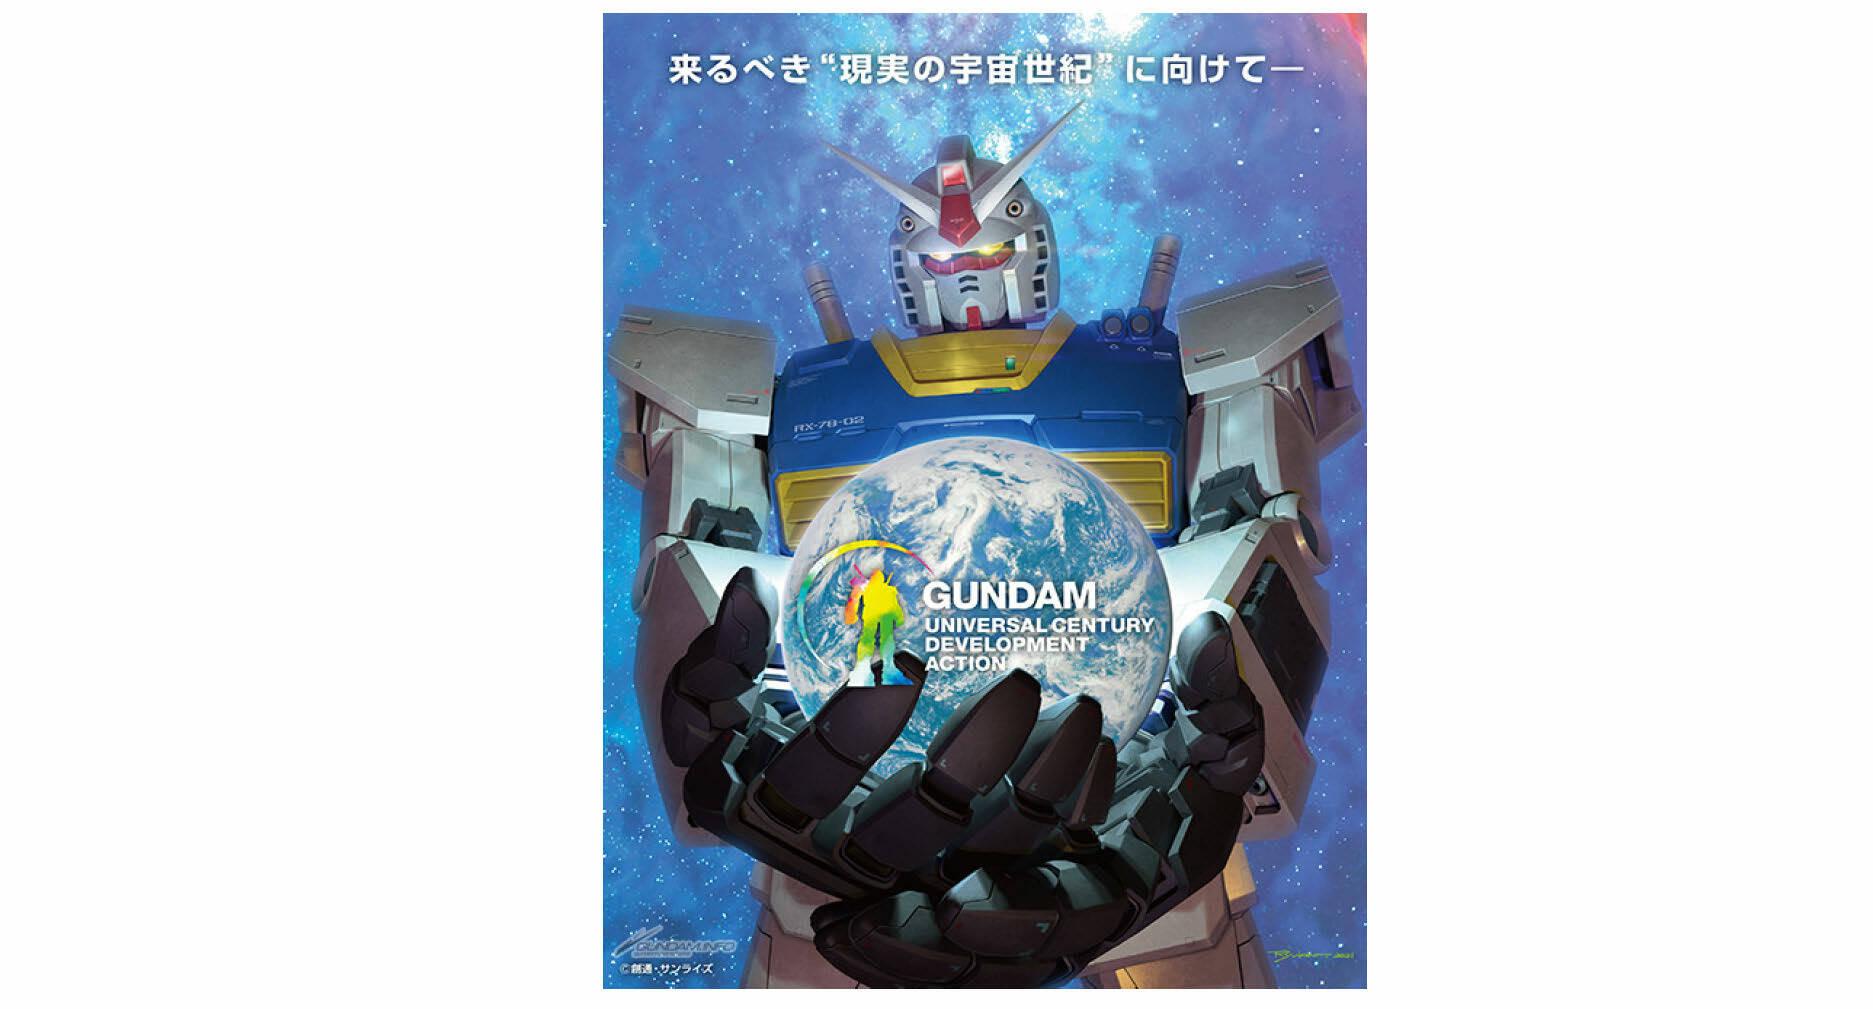 Gundam Universal Century Development Action